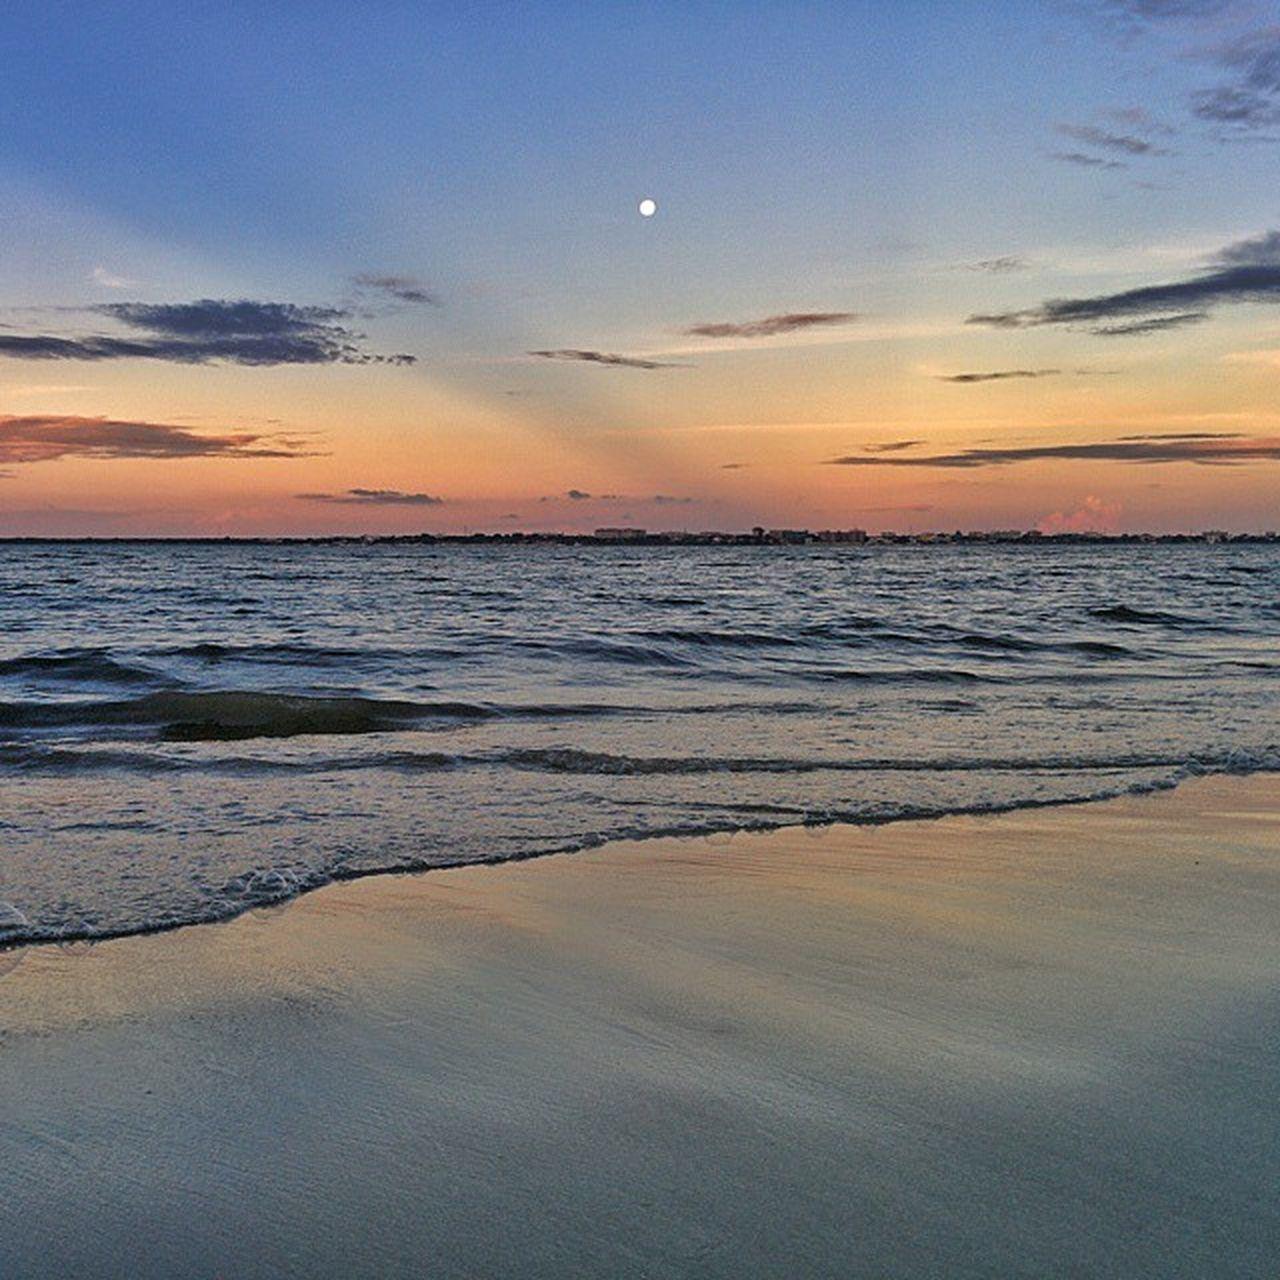 Good Evening | Tanzania . . . Afrique Silhouette Sunsets Beach Visiterlafrique Evening Tanzania Daressalaam Indaressalaam Nexus5 Nexusgraphy 😚